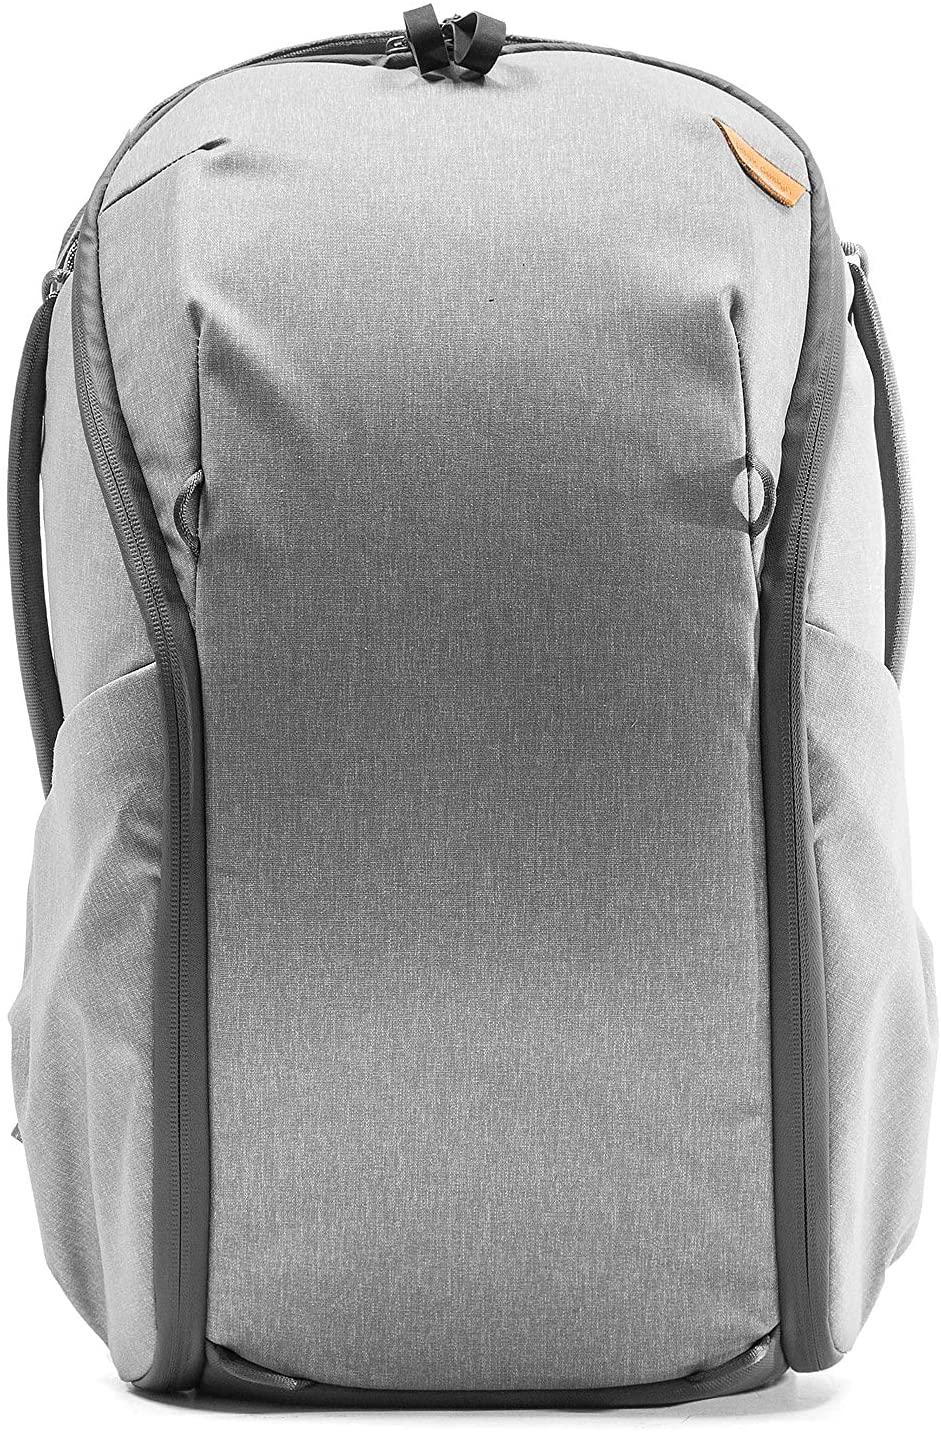 Peak Design Everyday Backpack 20L Zip (Ash)